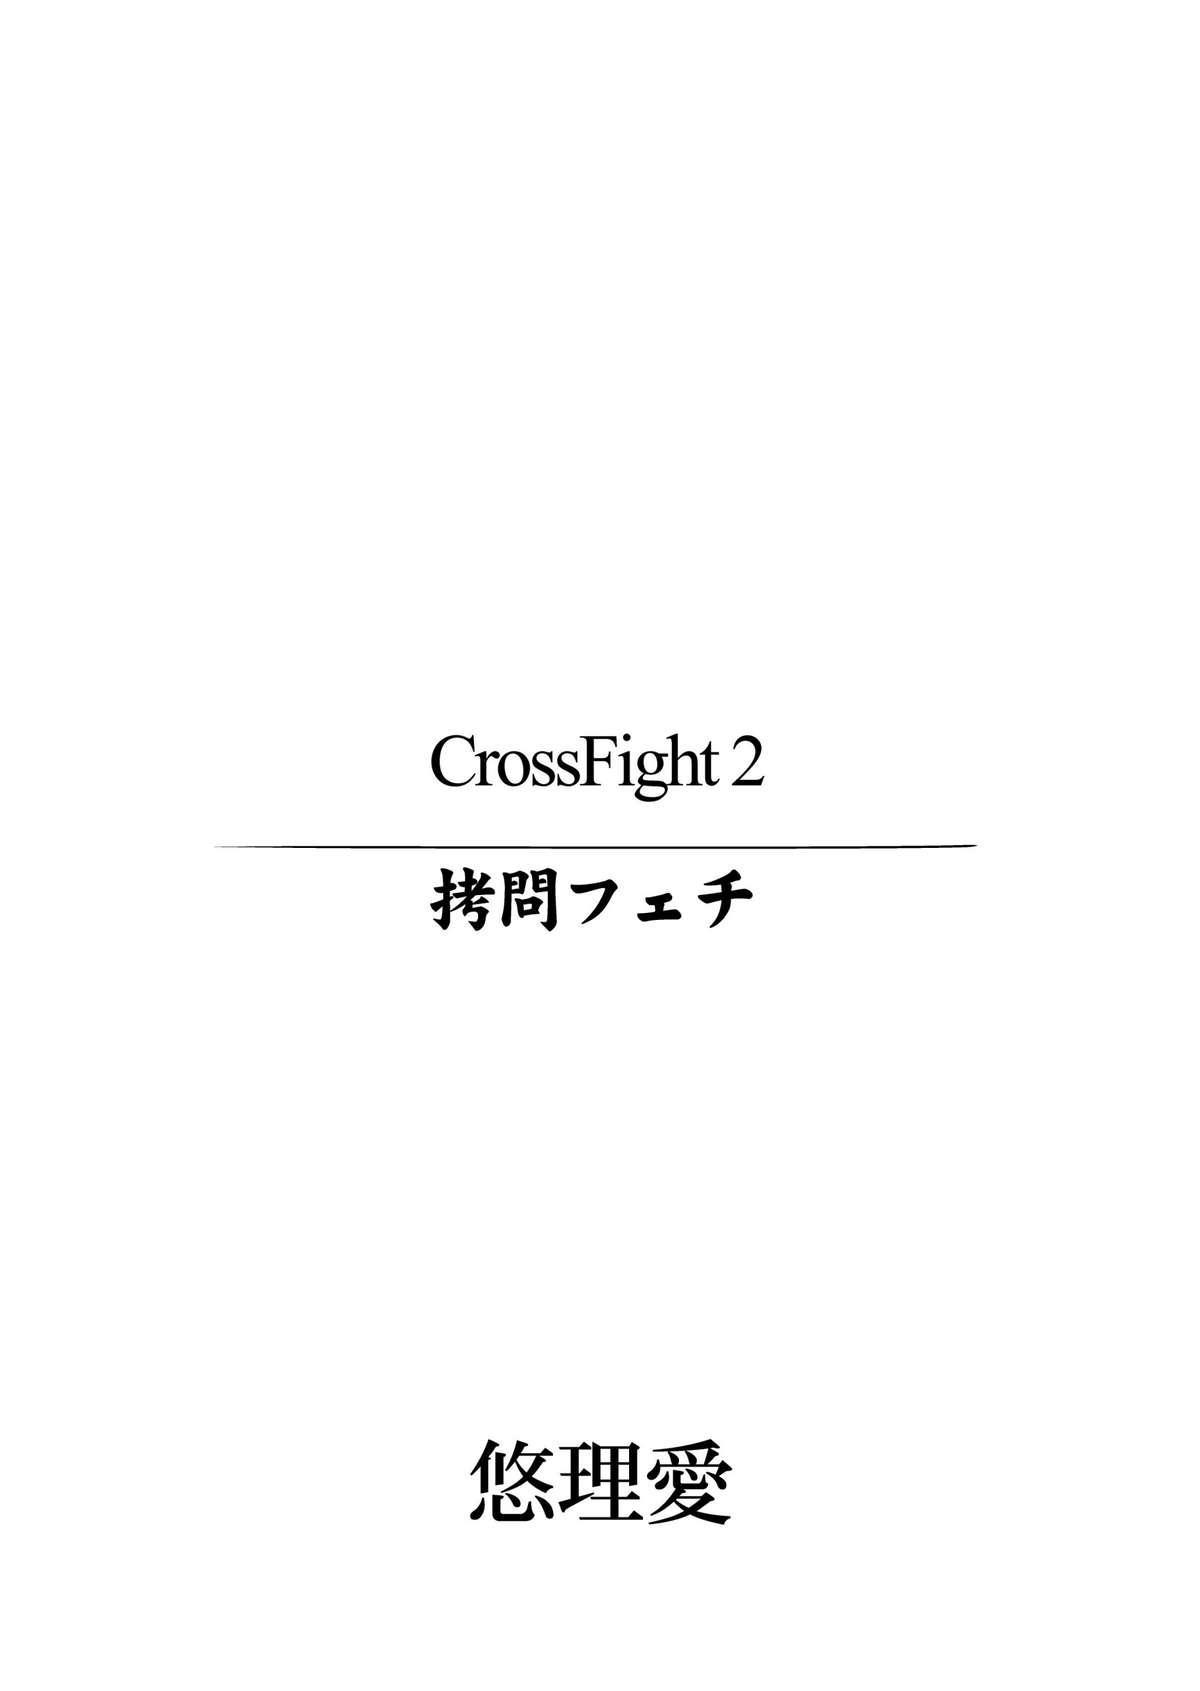 CrossFight 2 1